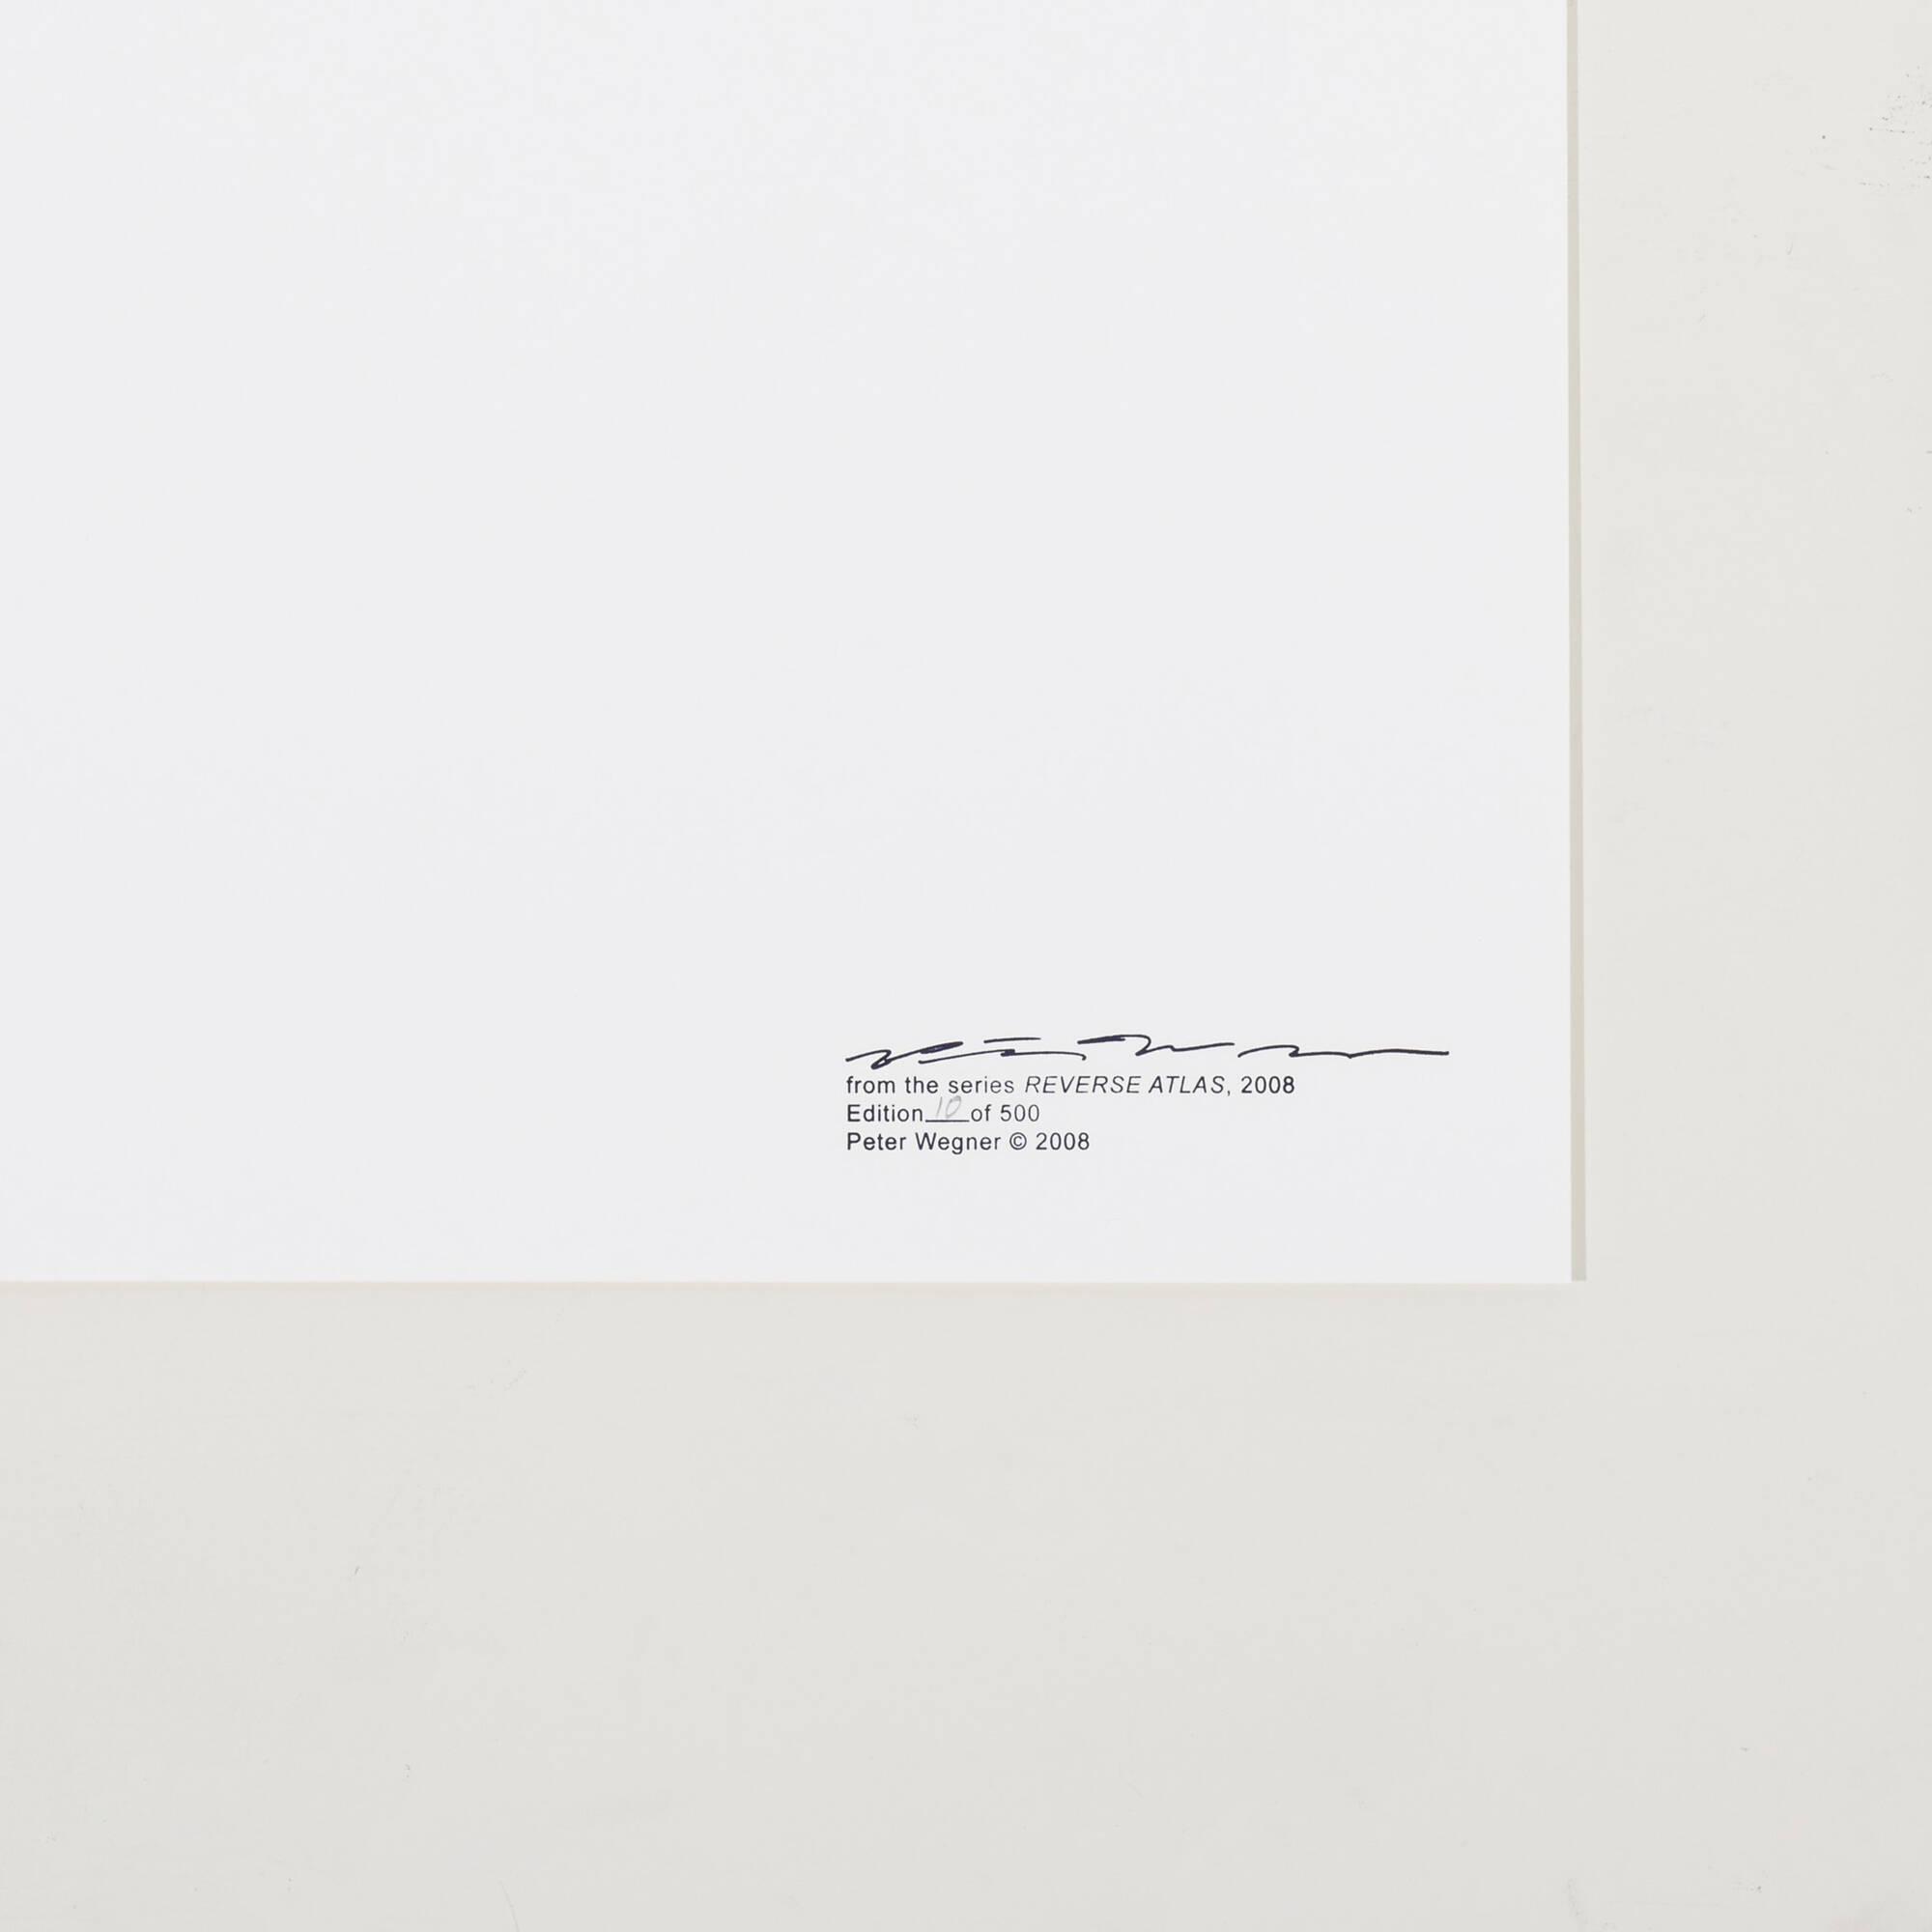 107: Peter Wegner / Reverse Atlas (ten works) (2 of 2)